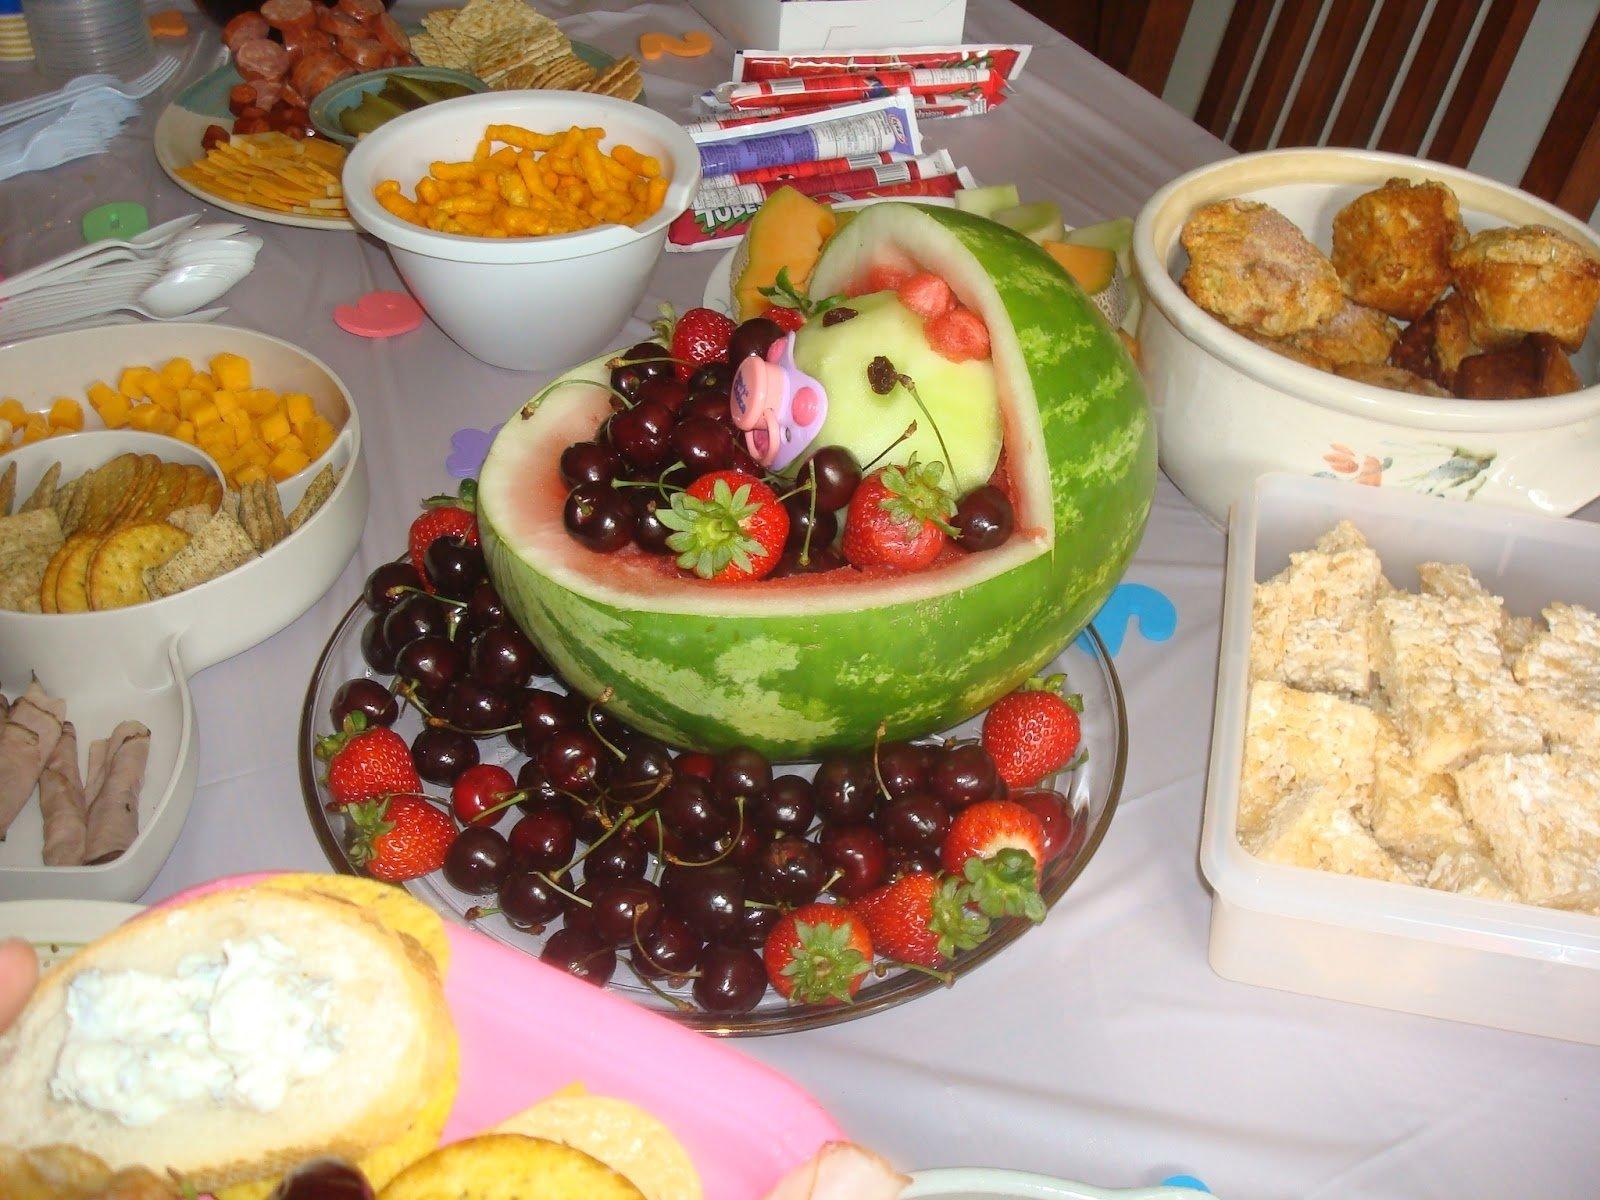 10 Unique Simple Baby Shower Food Ideas magnificent baby shower food ideas for boy maxresdefault cheap 2020